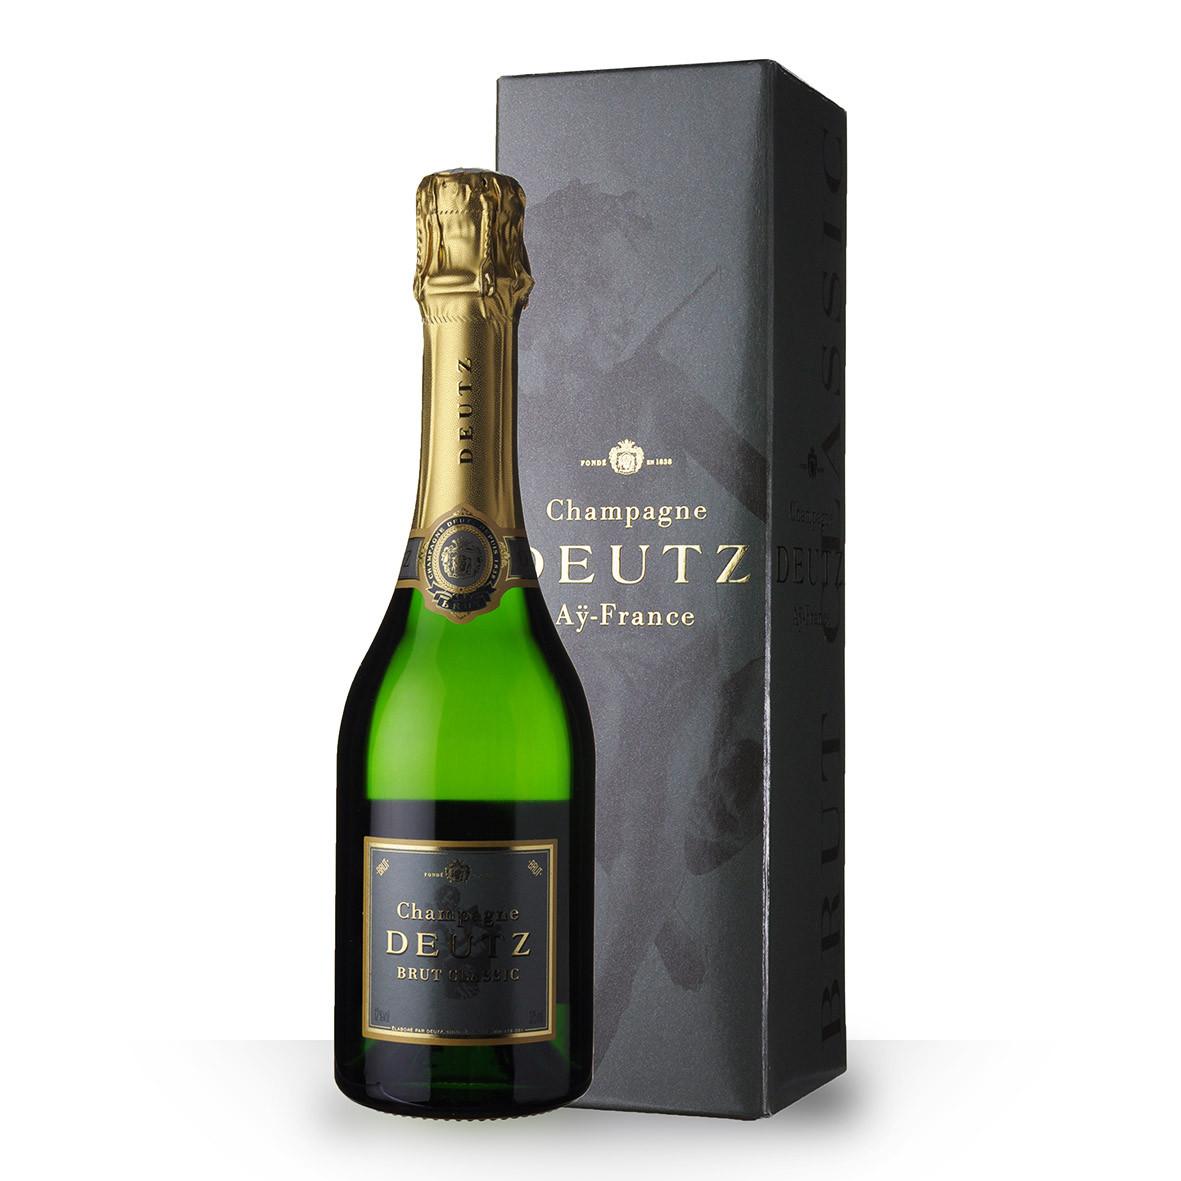 Champagne Deutz Brut Classic 37,5cl Etui www.odyssee-vins.com